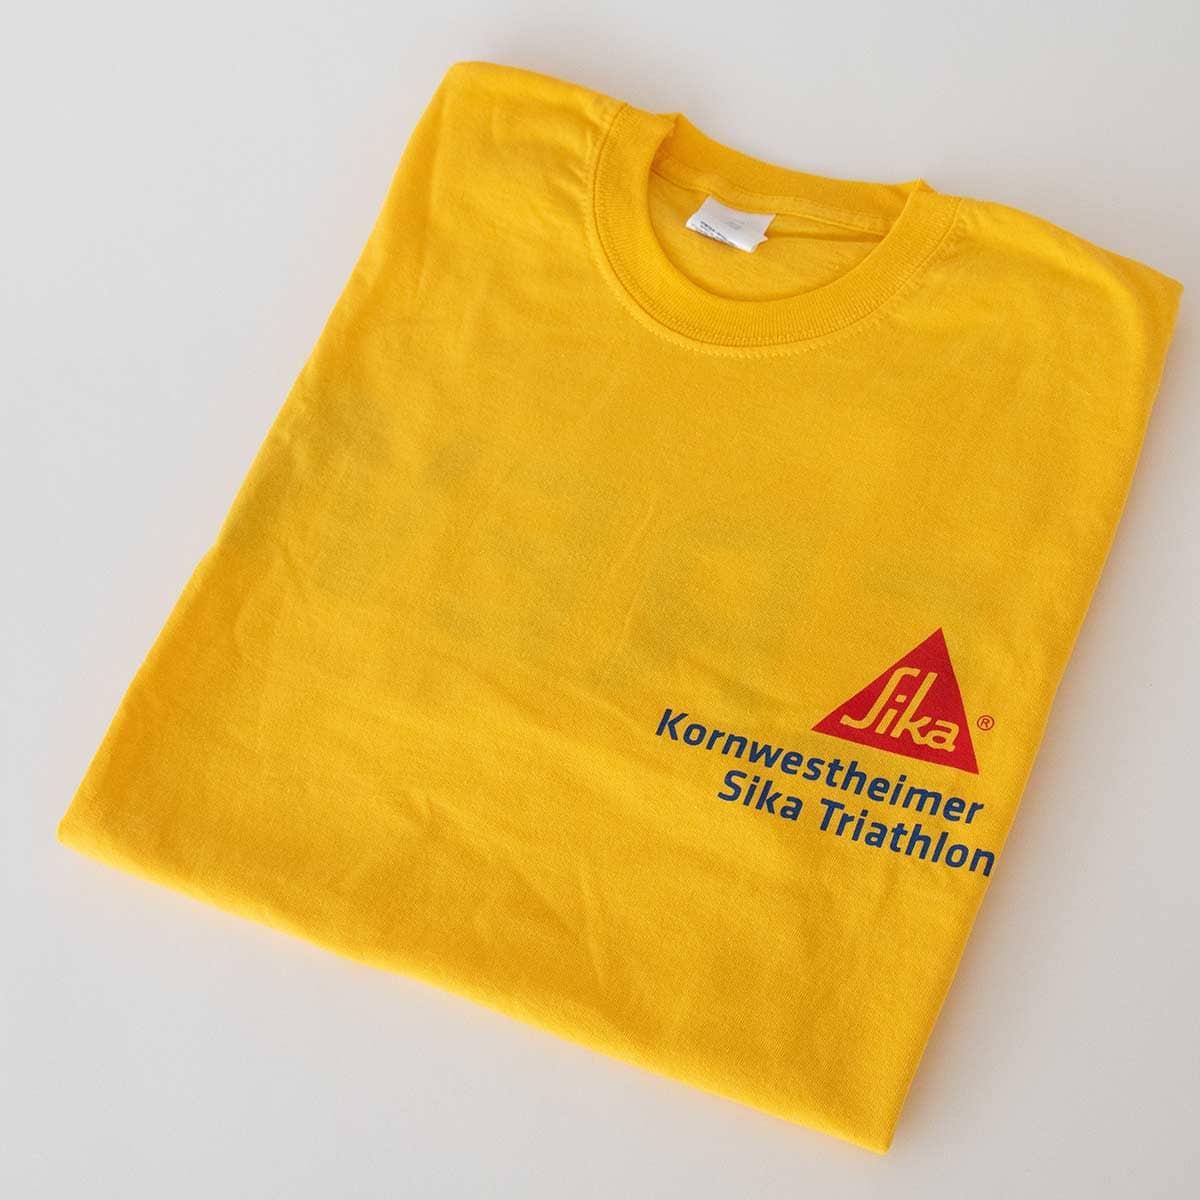 Juerg Siegrist AG - SIKA Kornwestheimer Triathlon T-Shirt